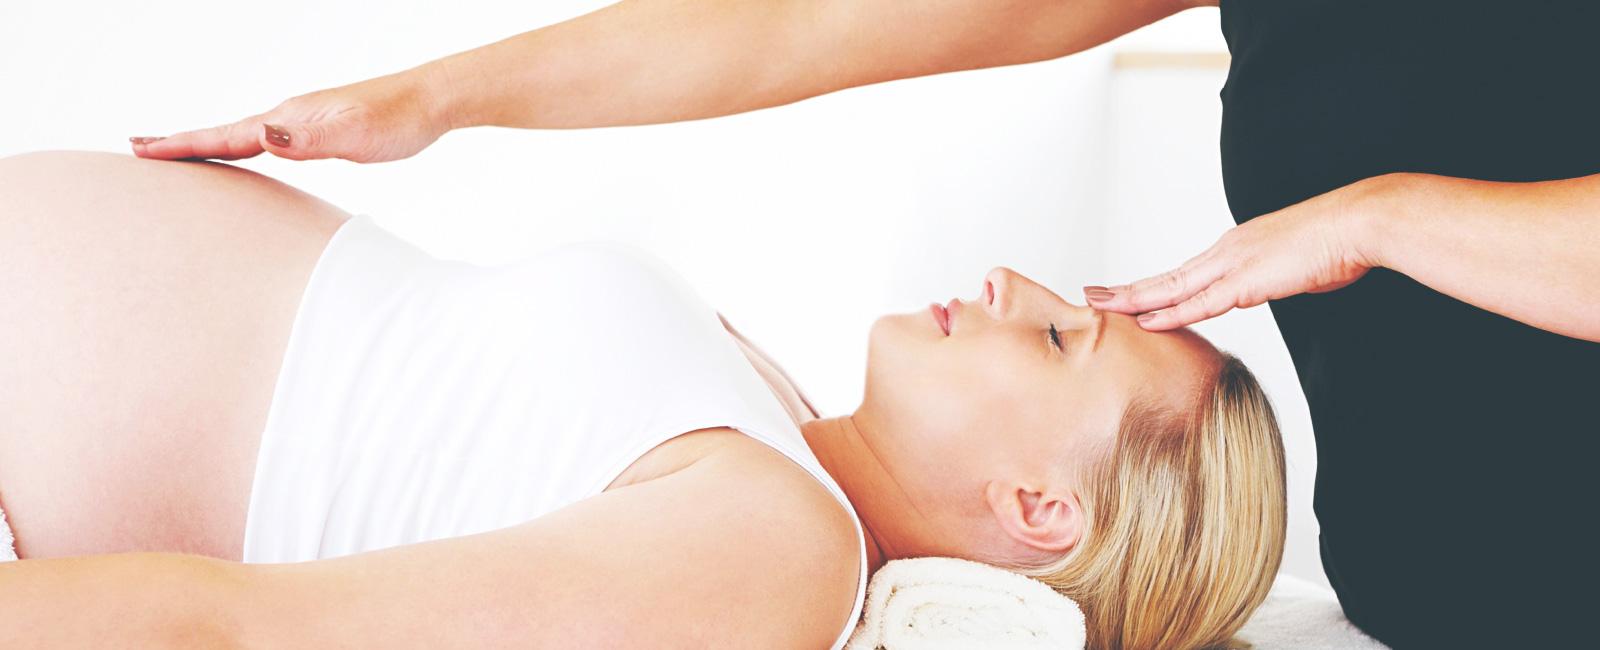 pregnancy spa jacksonville pregnancy spa treatments